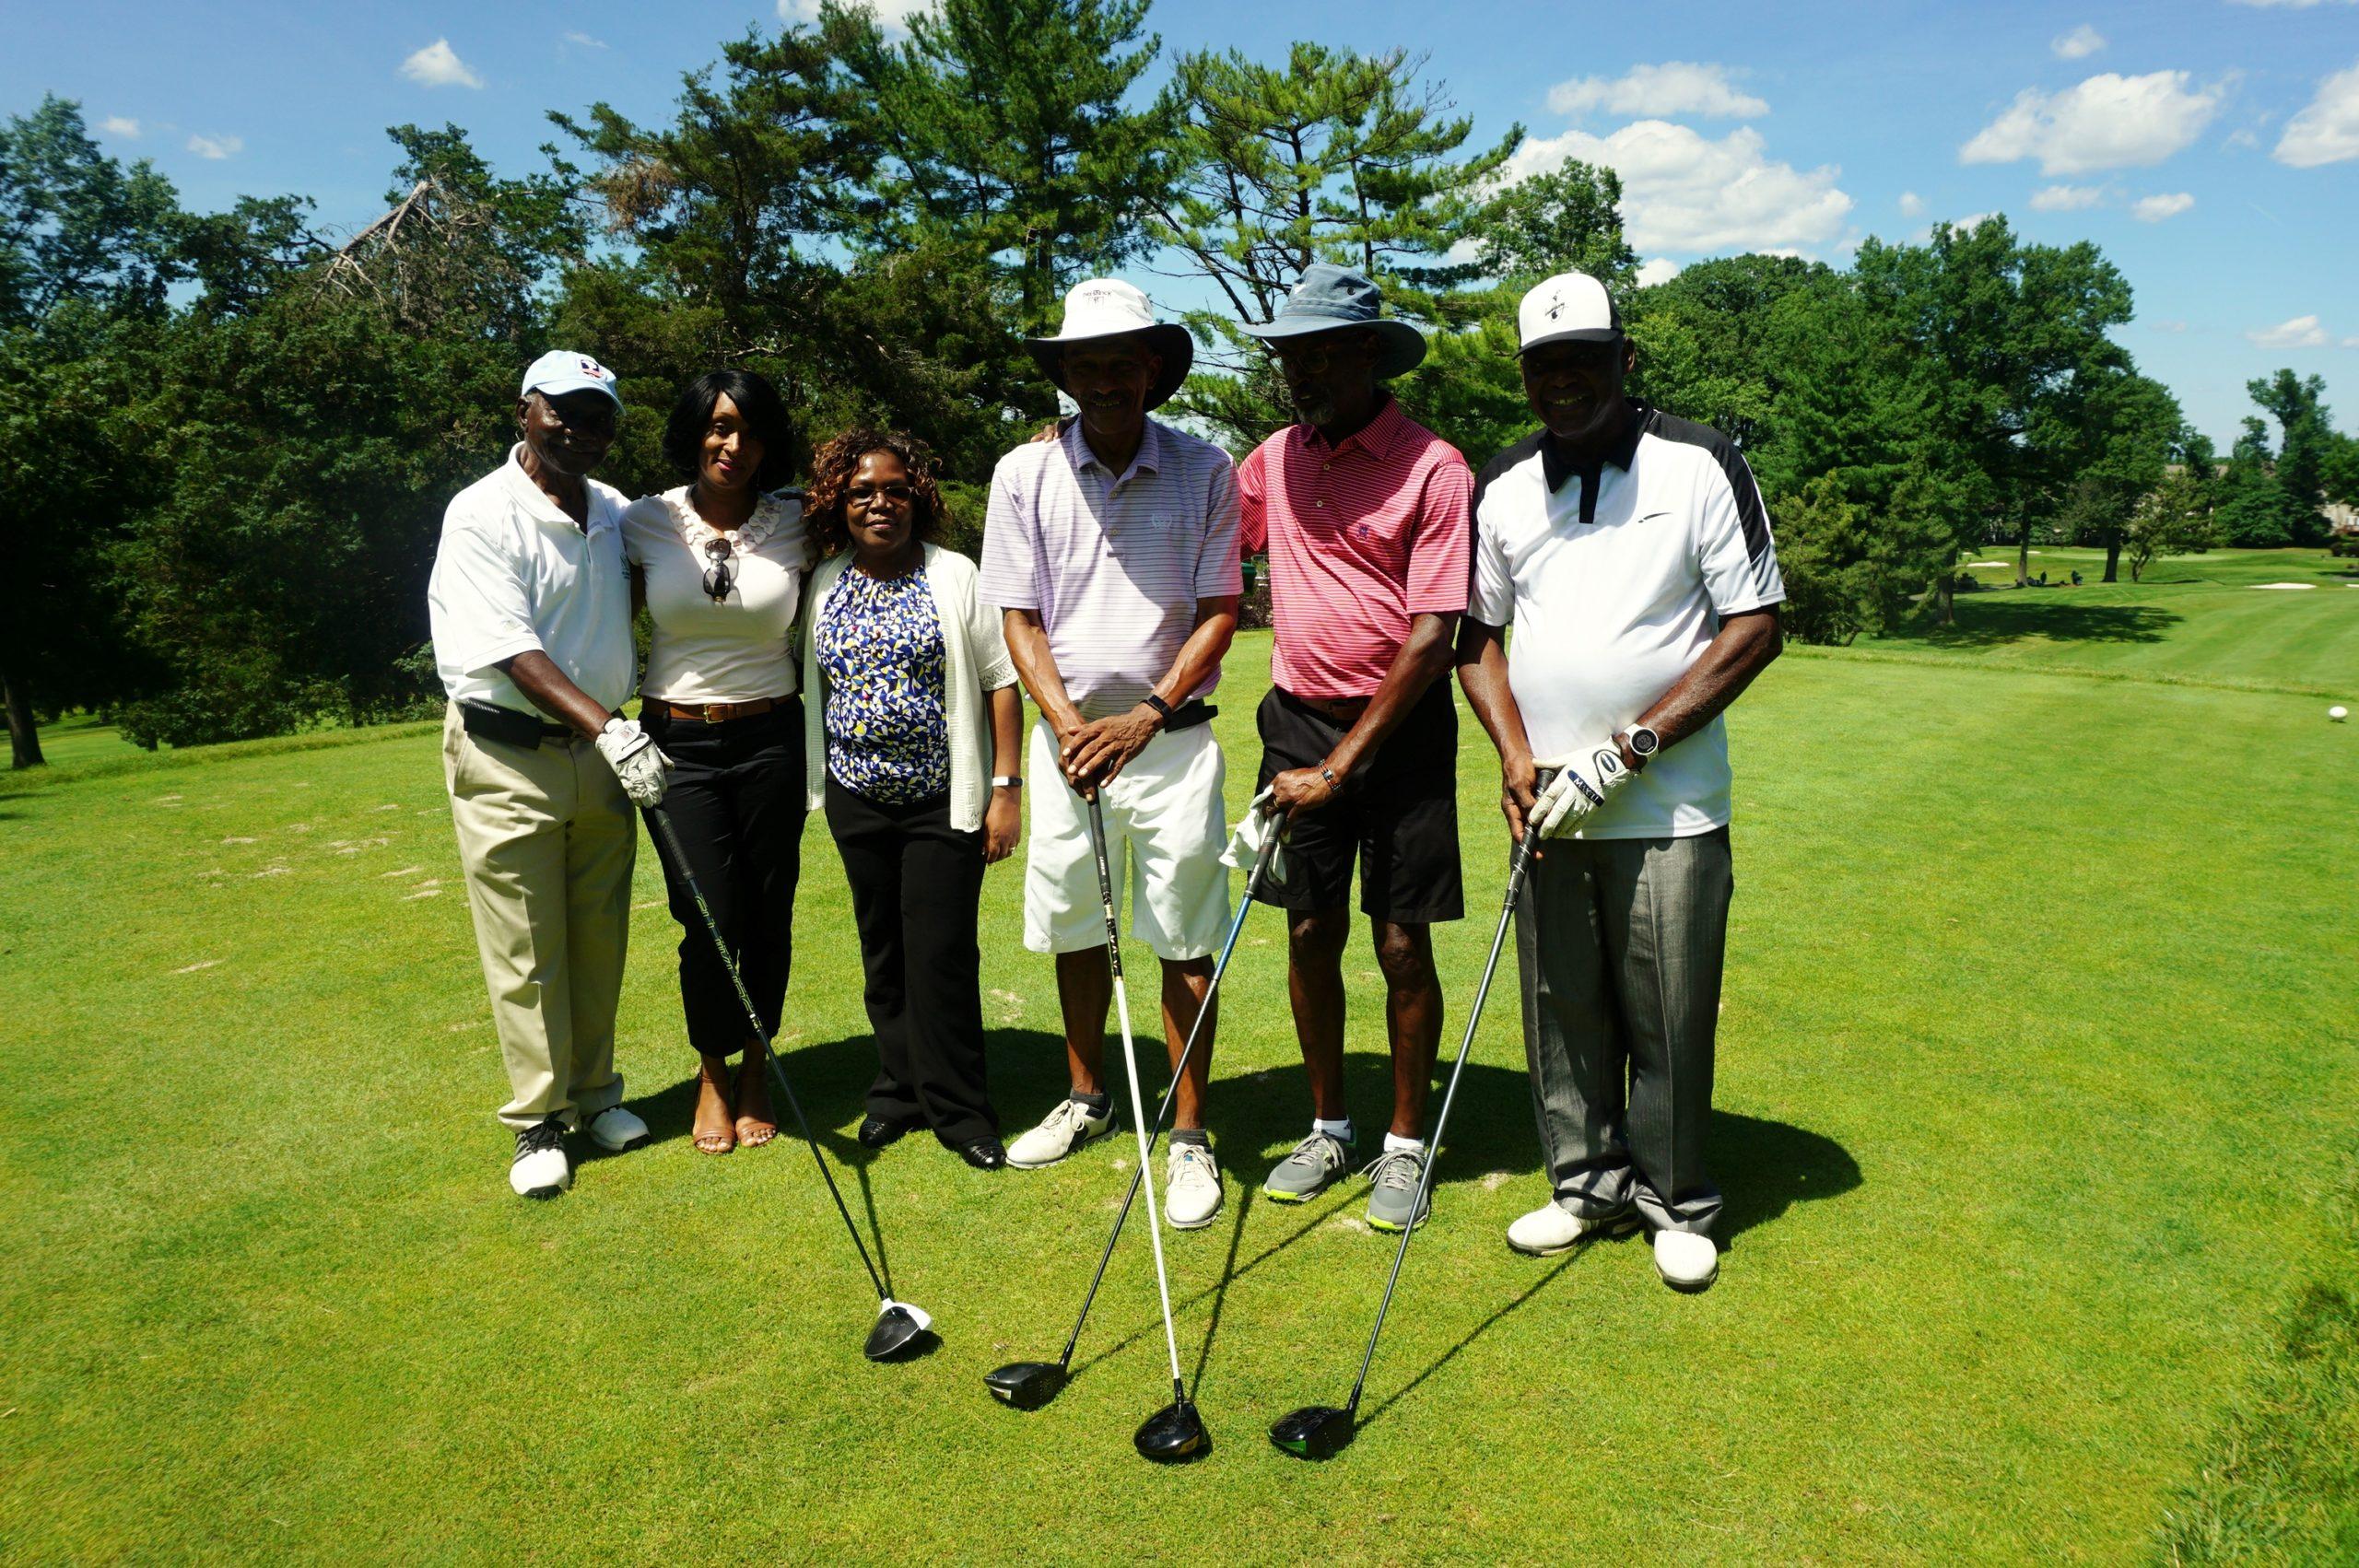 New Community Hosts 25th Annual Golf Classic